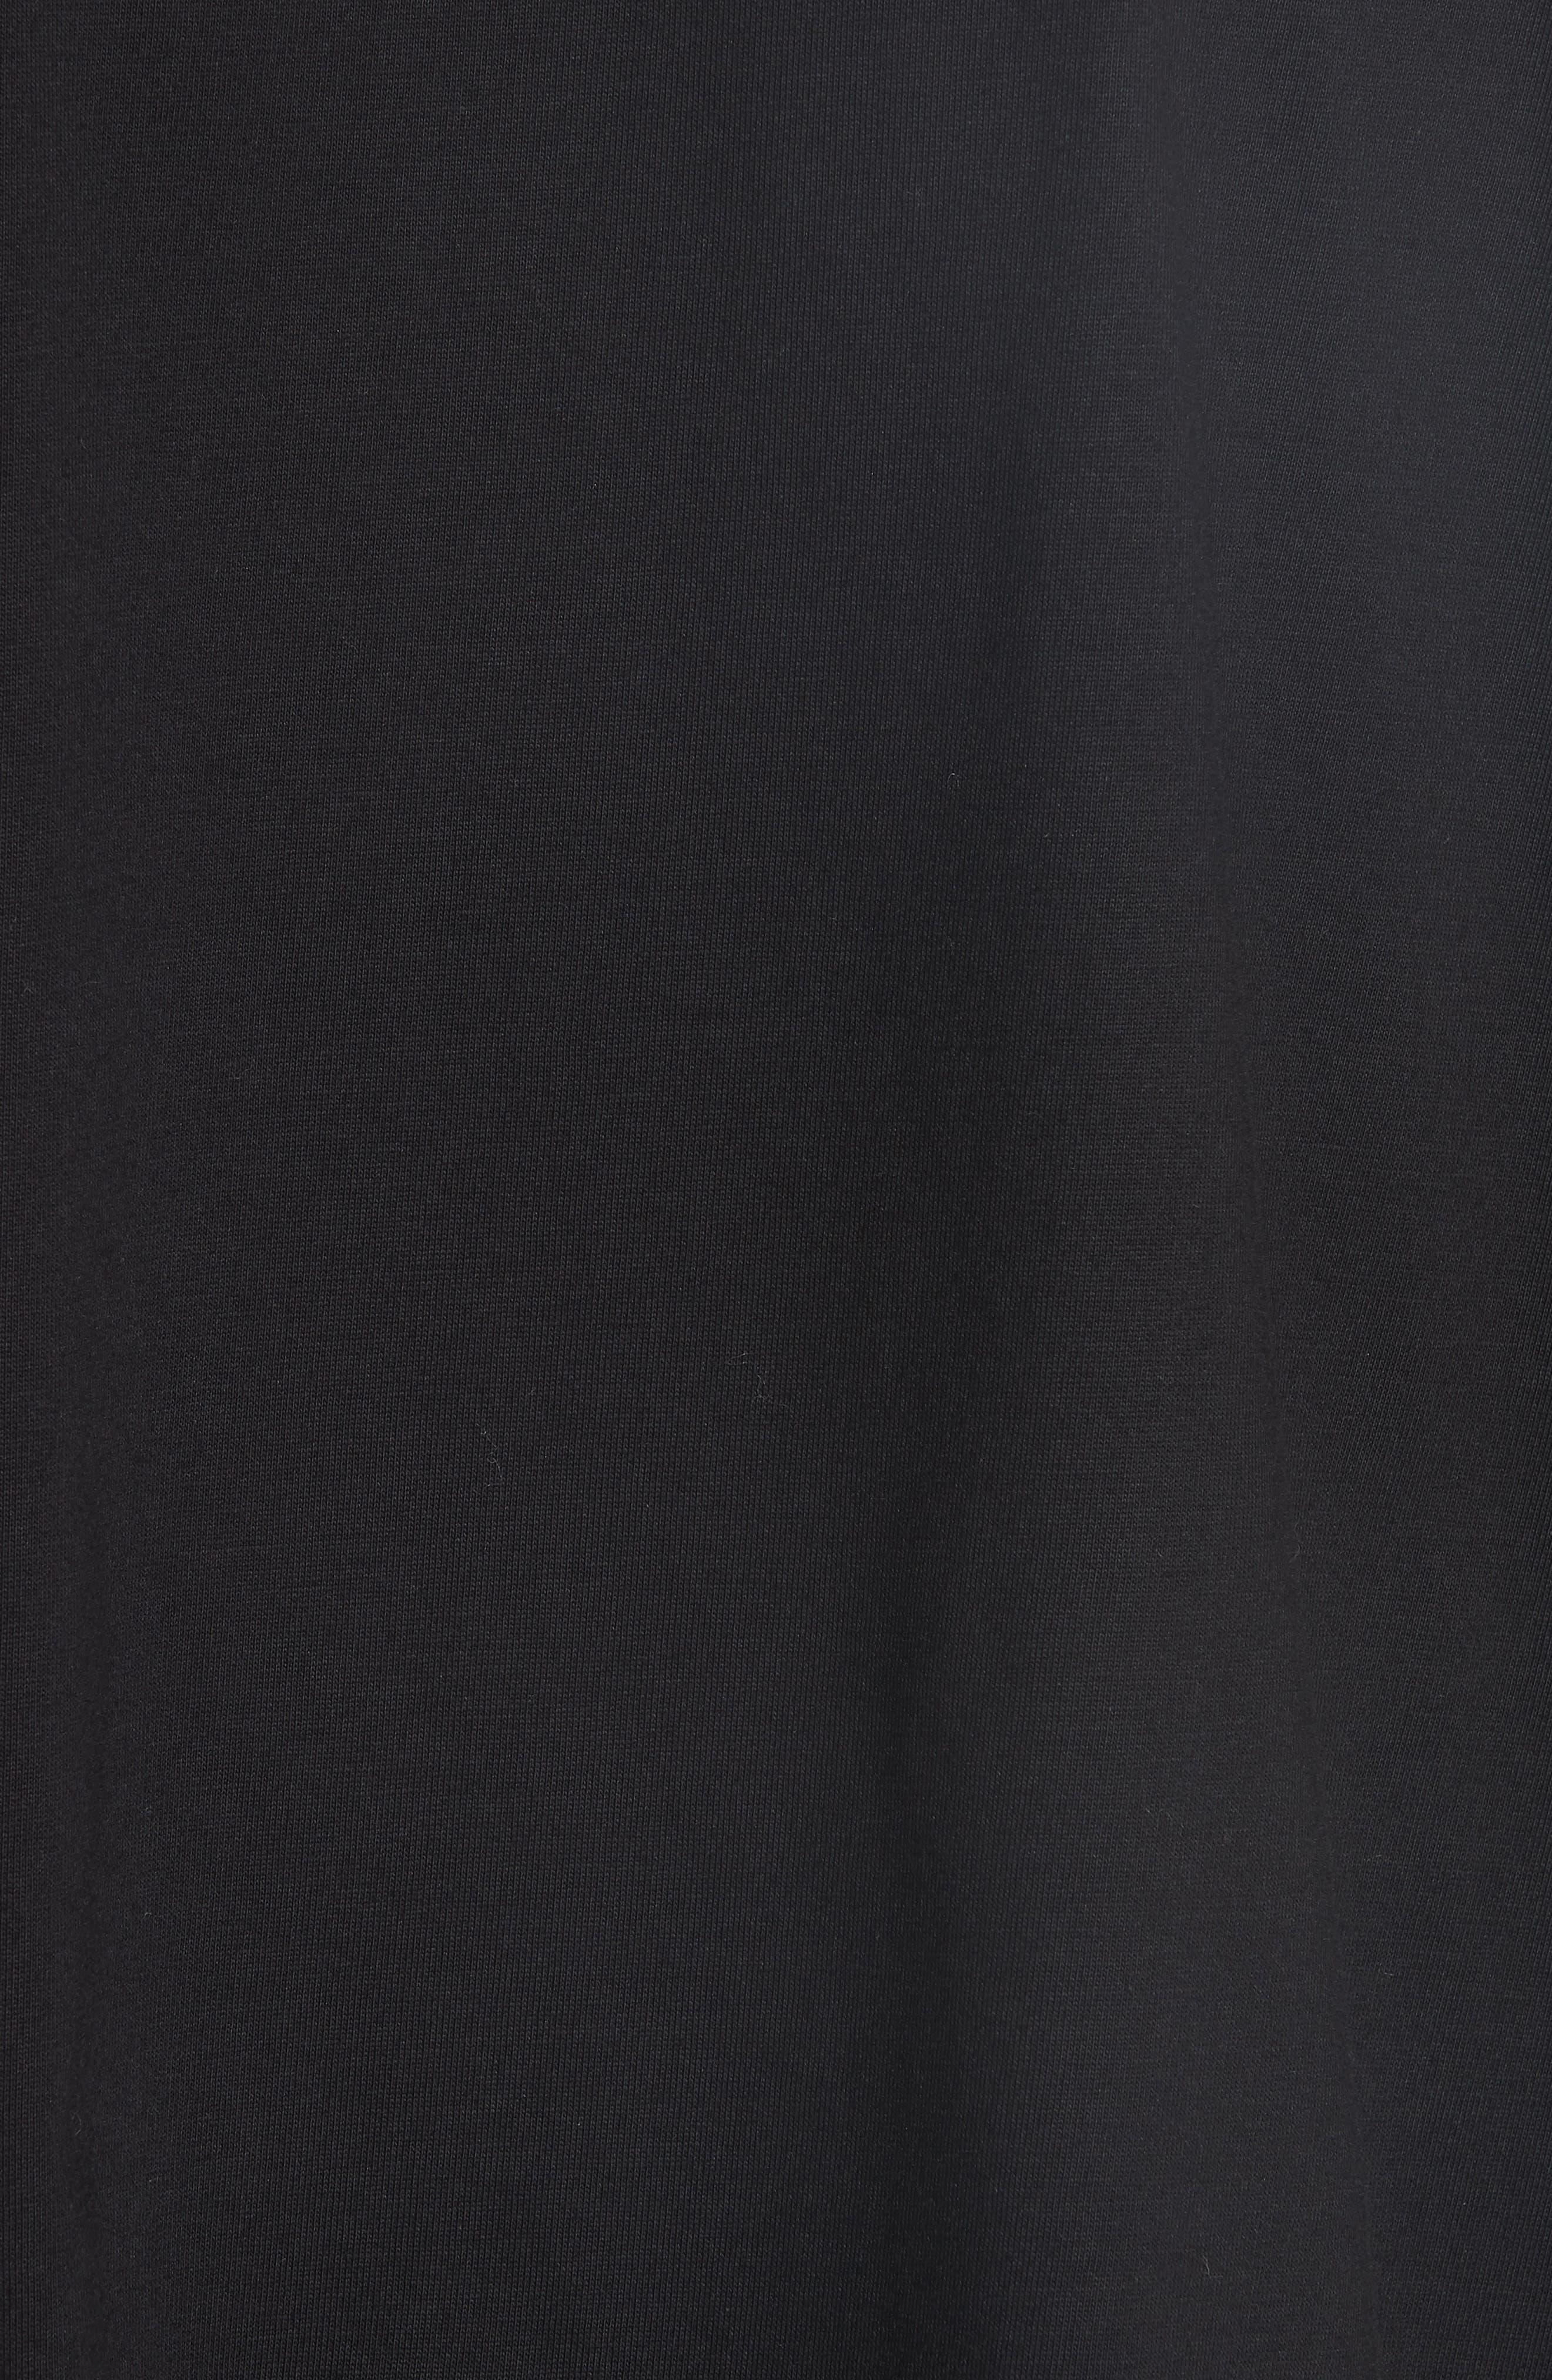 Lace Sleeve Top,                             Alternate thumbnail 5, color,                             Black